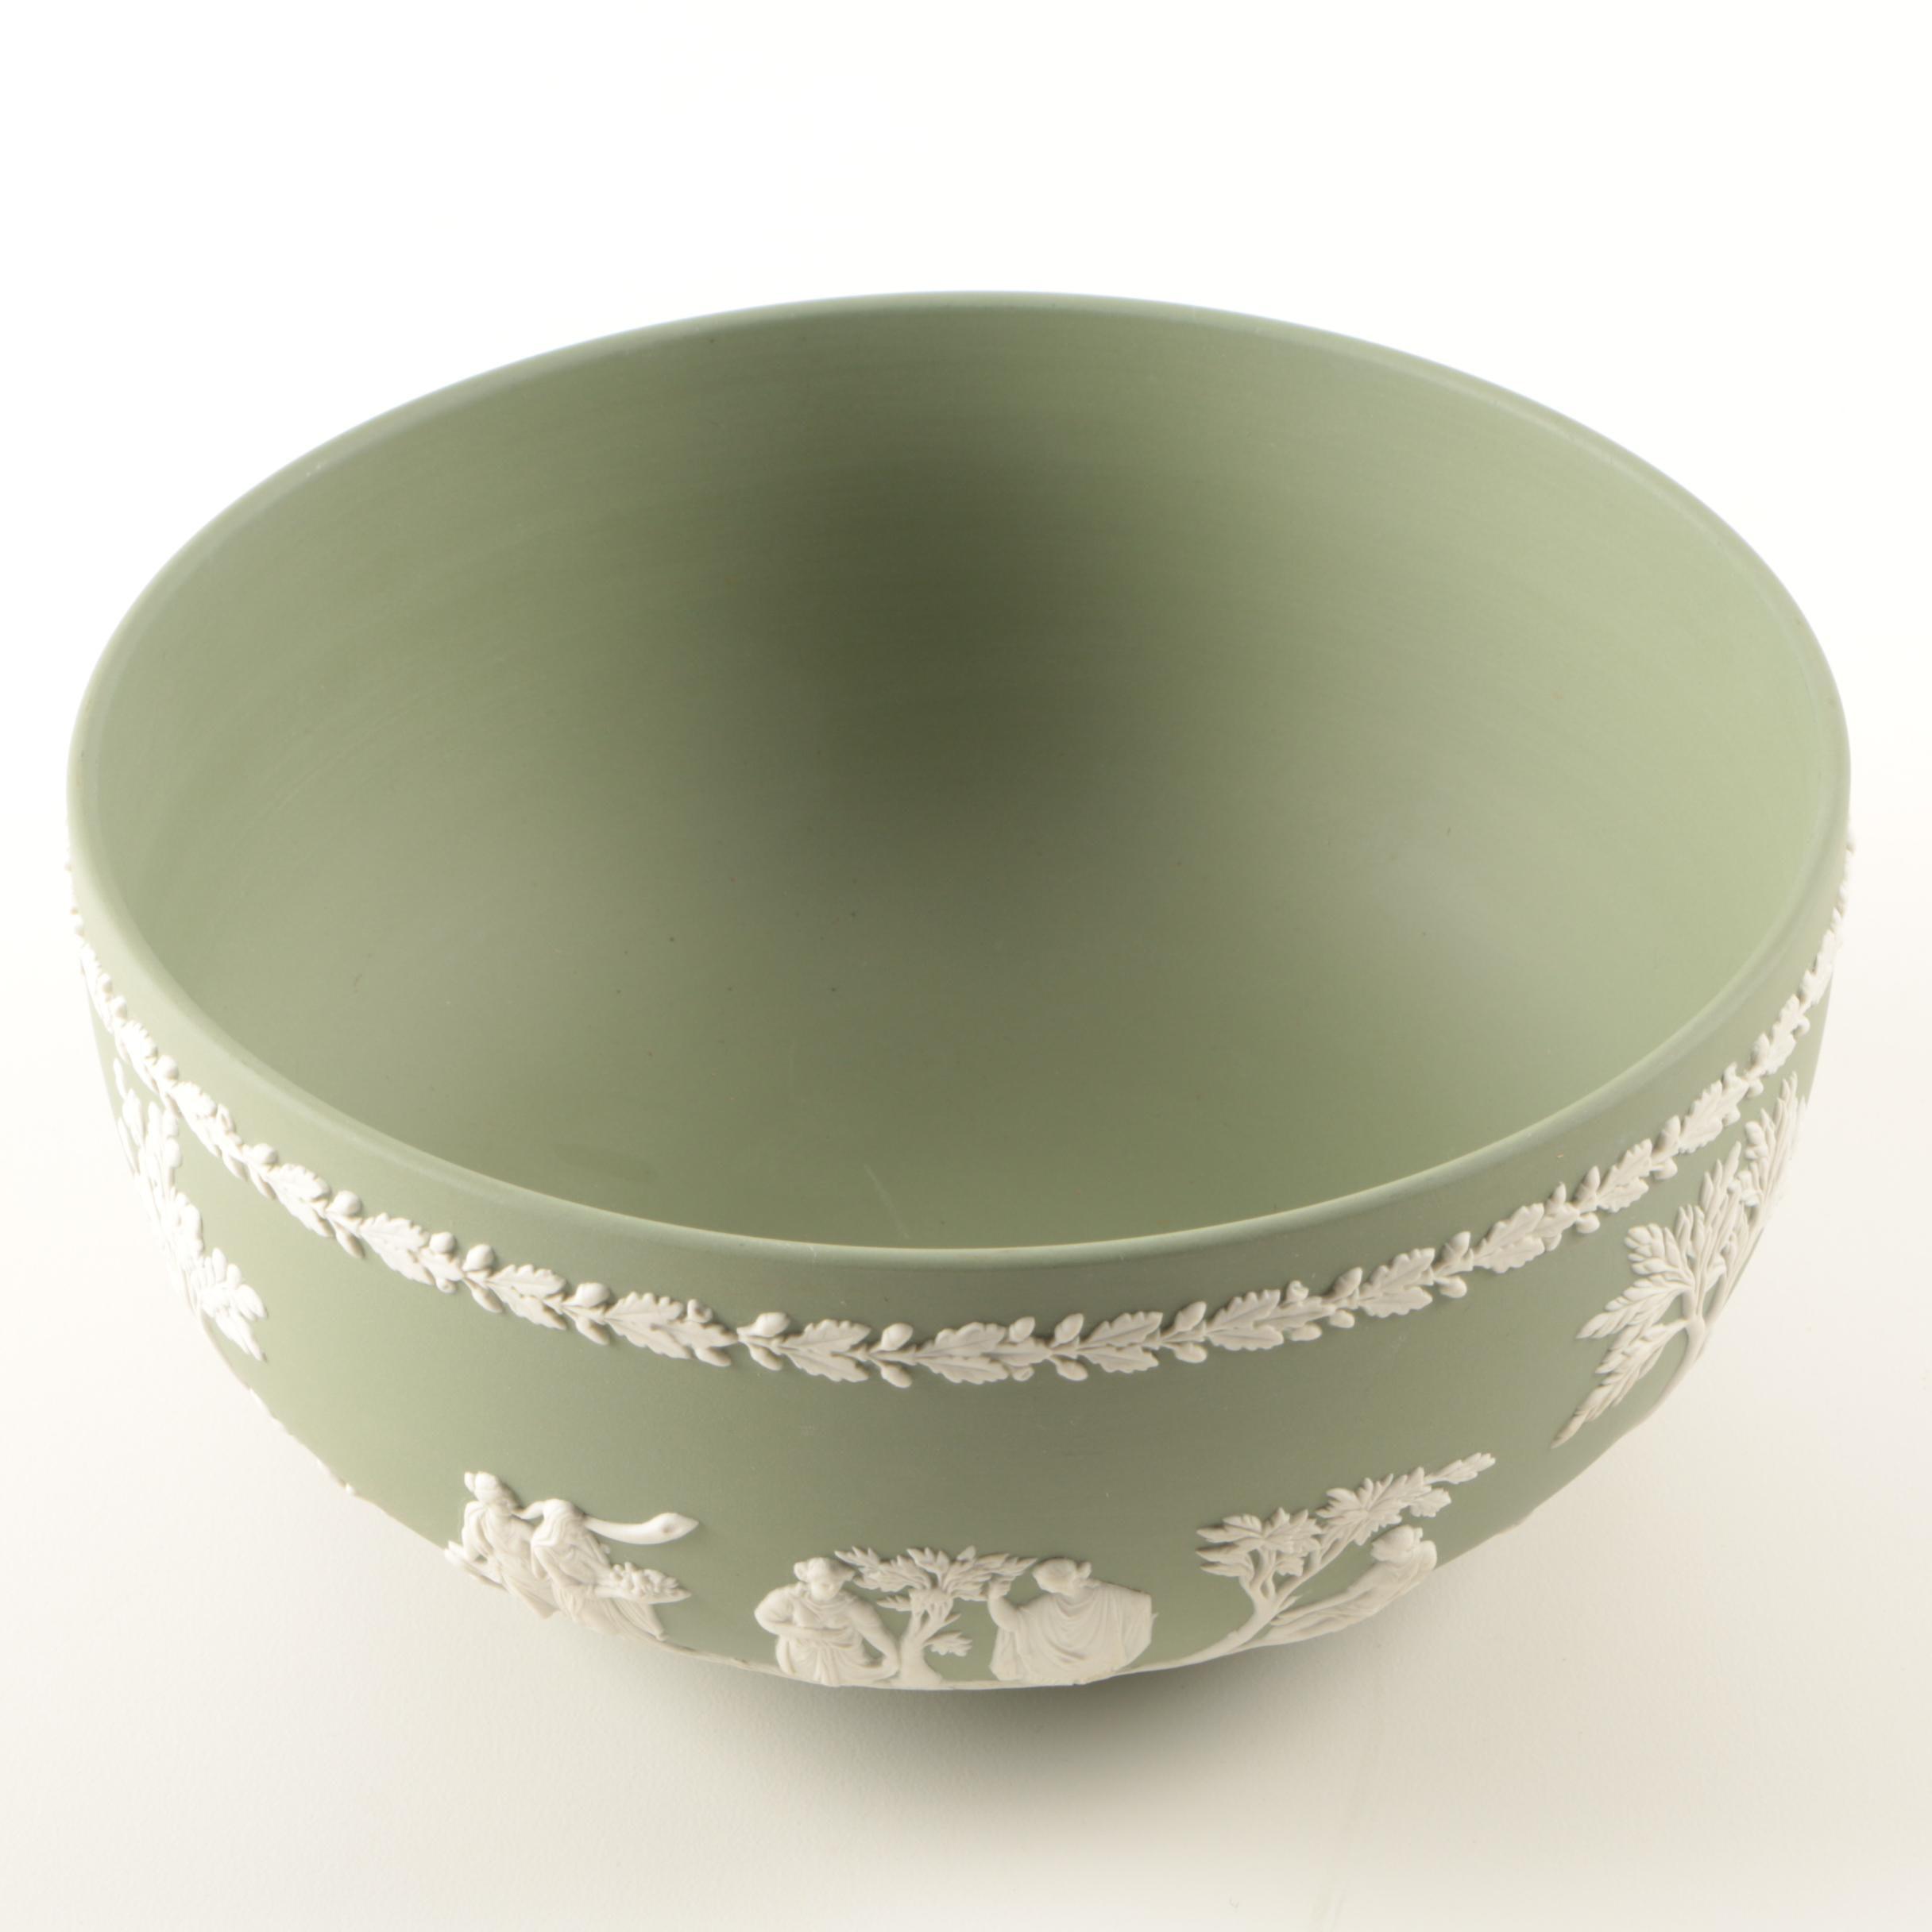 "Jasperware Bowl in the style of Wedgwood ""Sacrifice"""